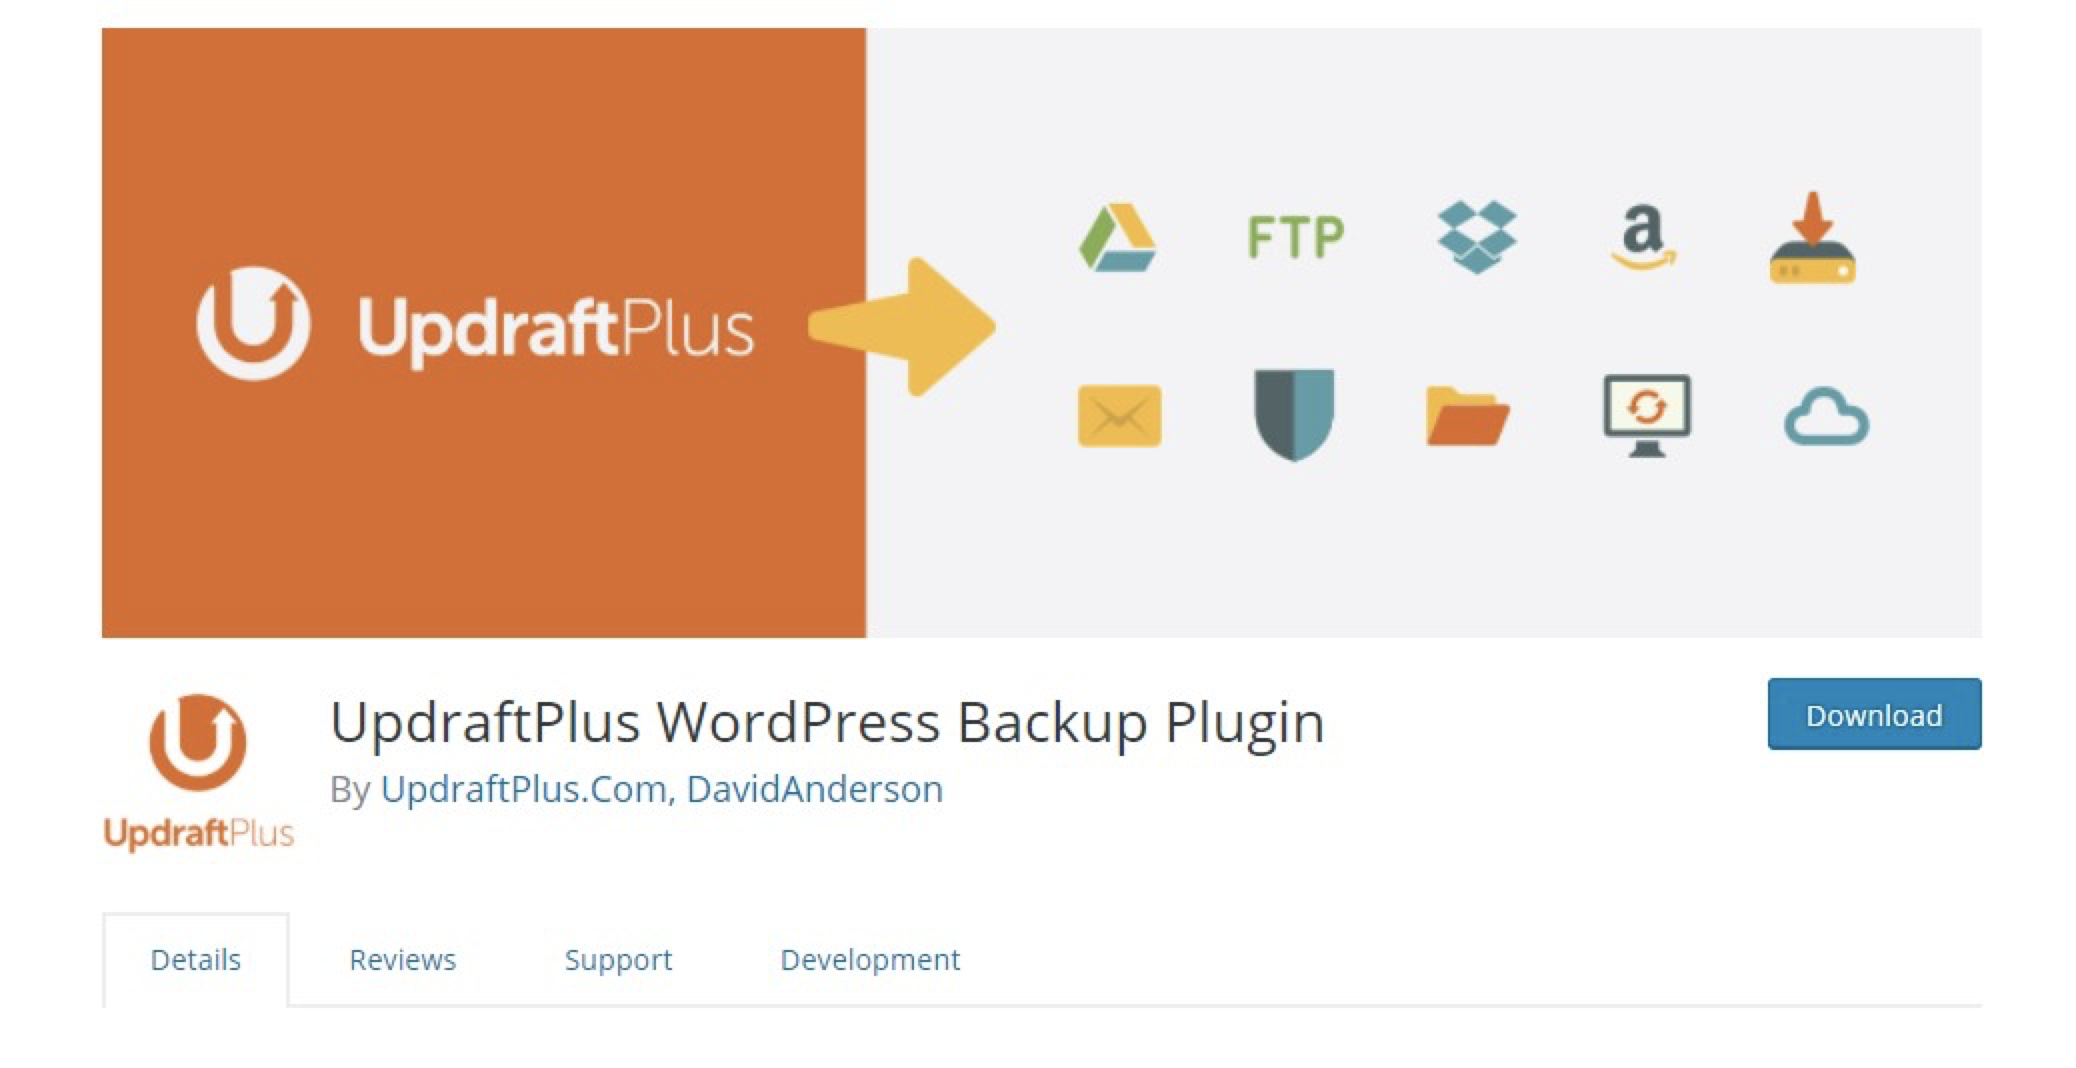 UpDraft Plus marketing image